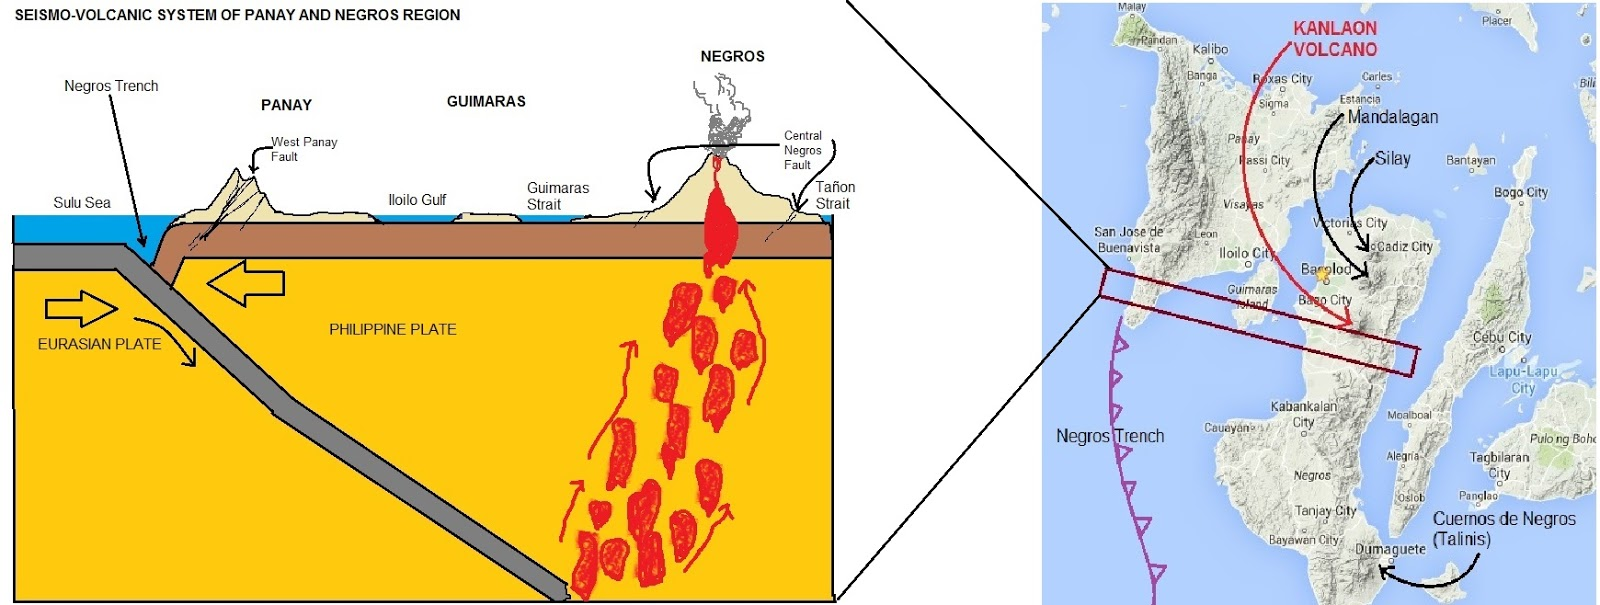 fig 1 the negros volcanic arc system and location of kanlaon volcano illustration by gdb alojado